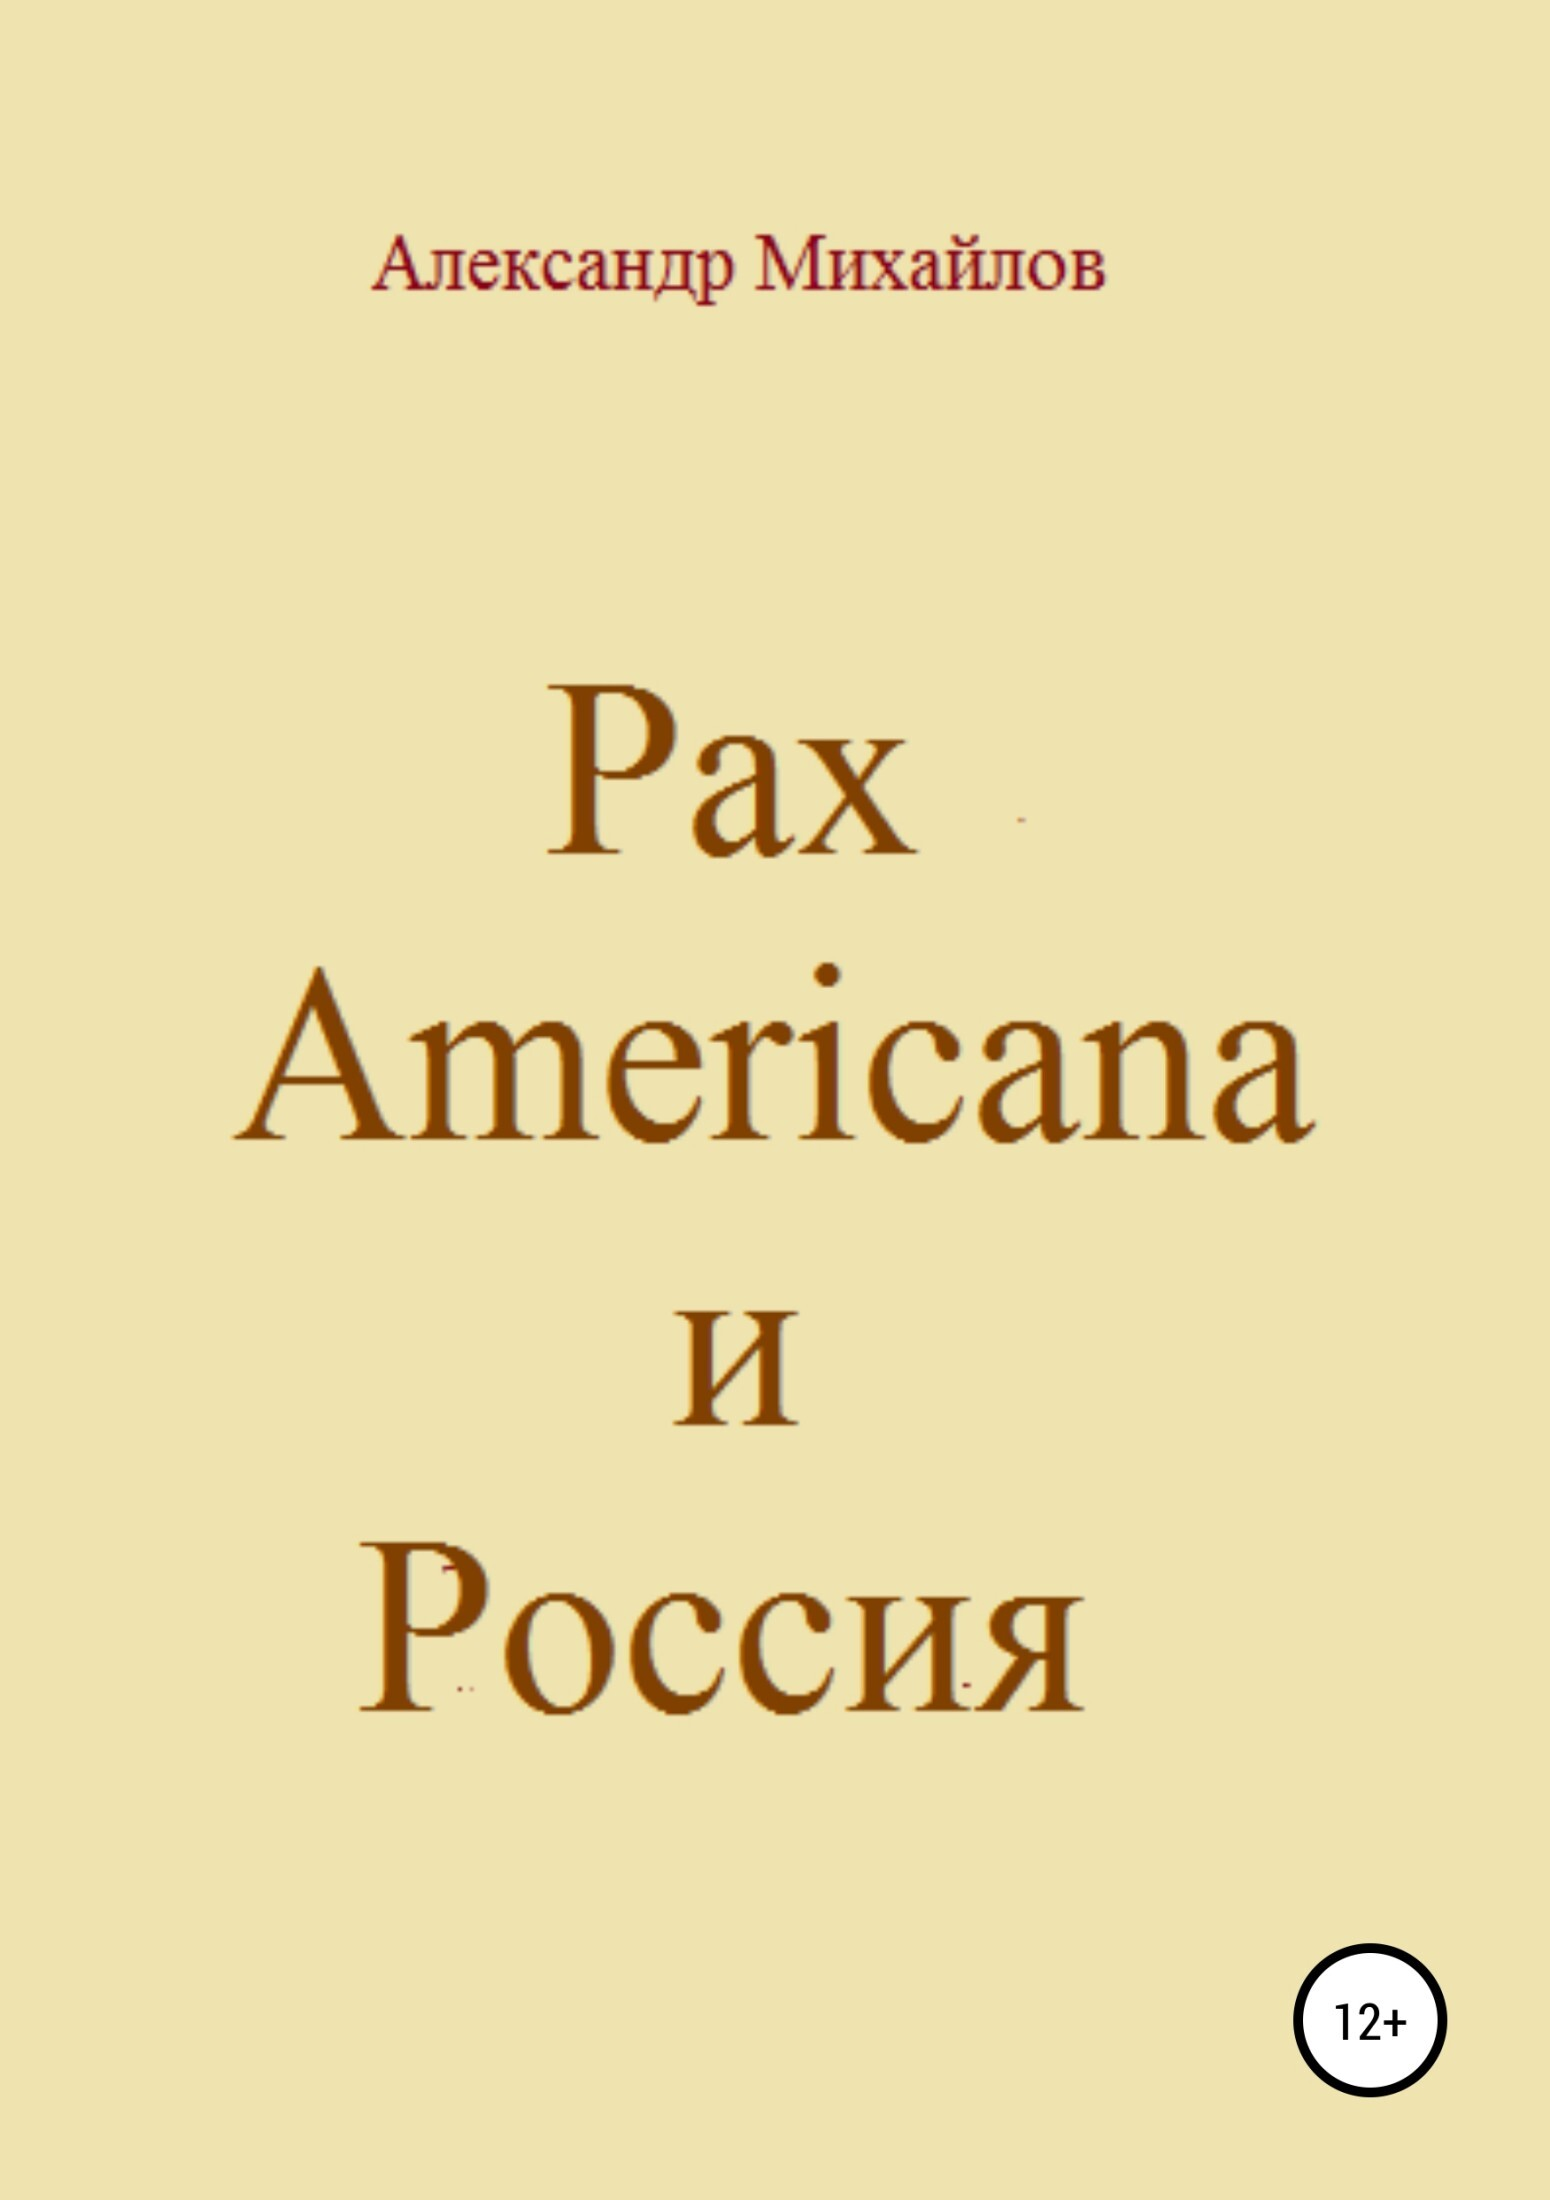 Обложка книги. Автор - Александр Михайлов